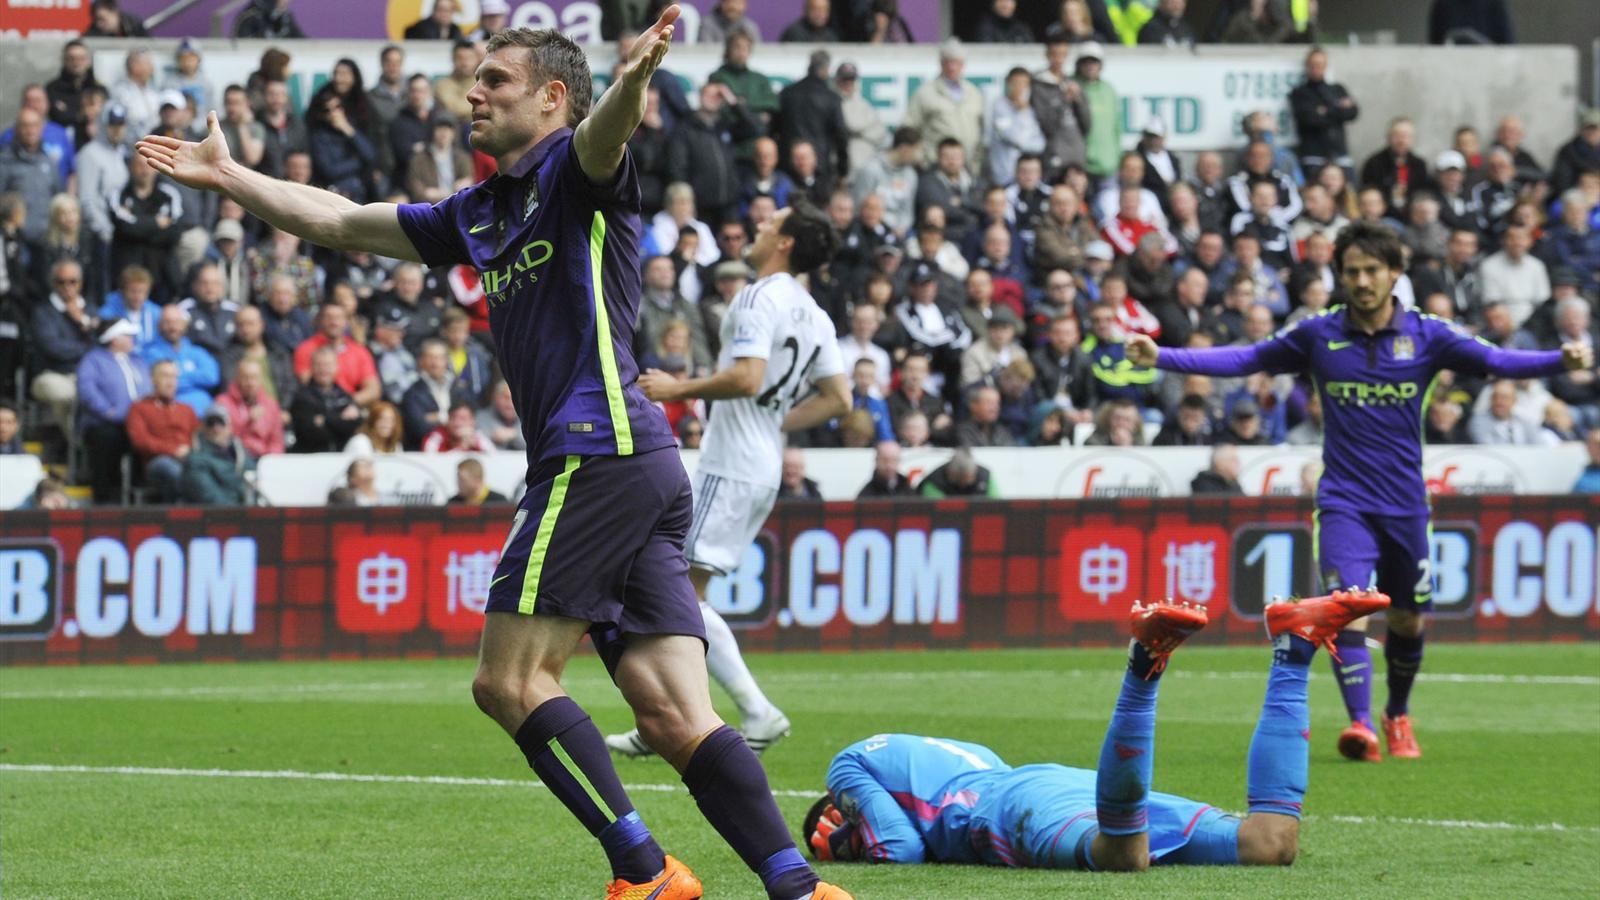 James Milner celebrates his goal against Swansea